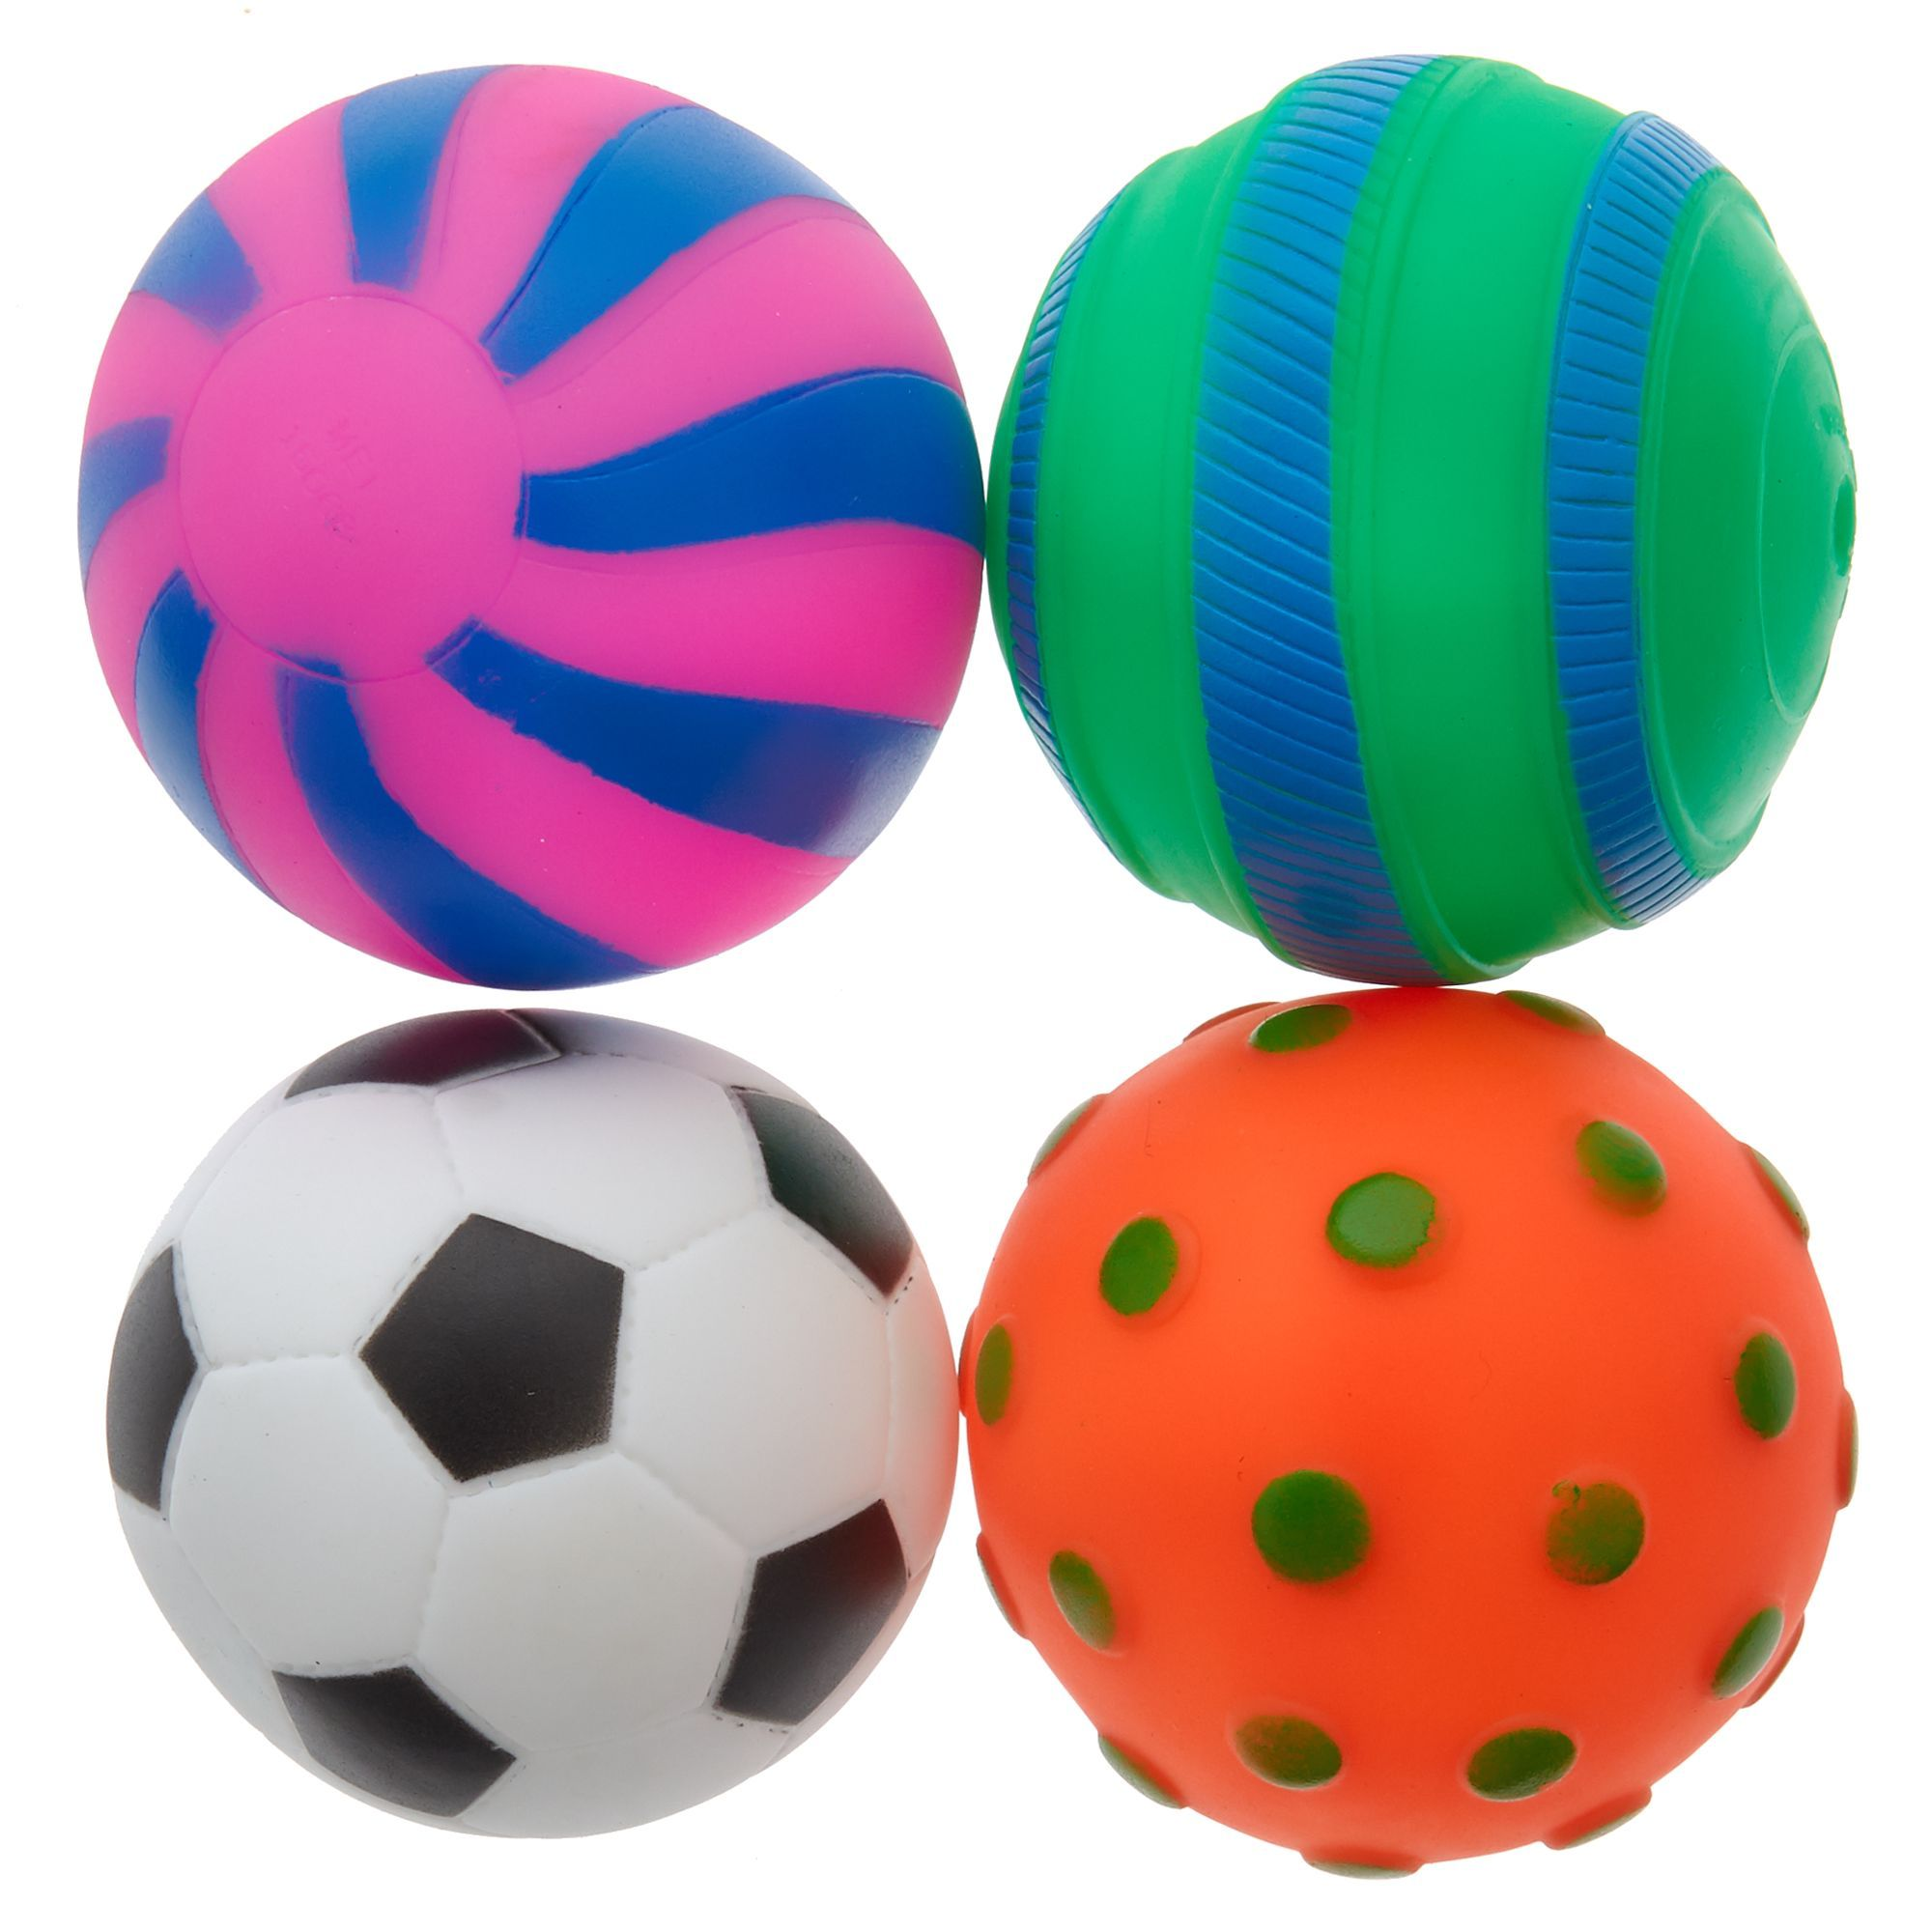 Grreat Choice Ball Dog Toys 4 Pack Great Choice Dog Toys Dog